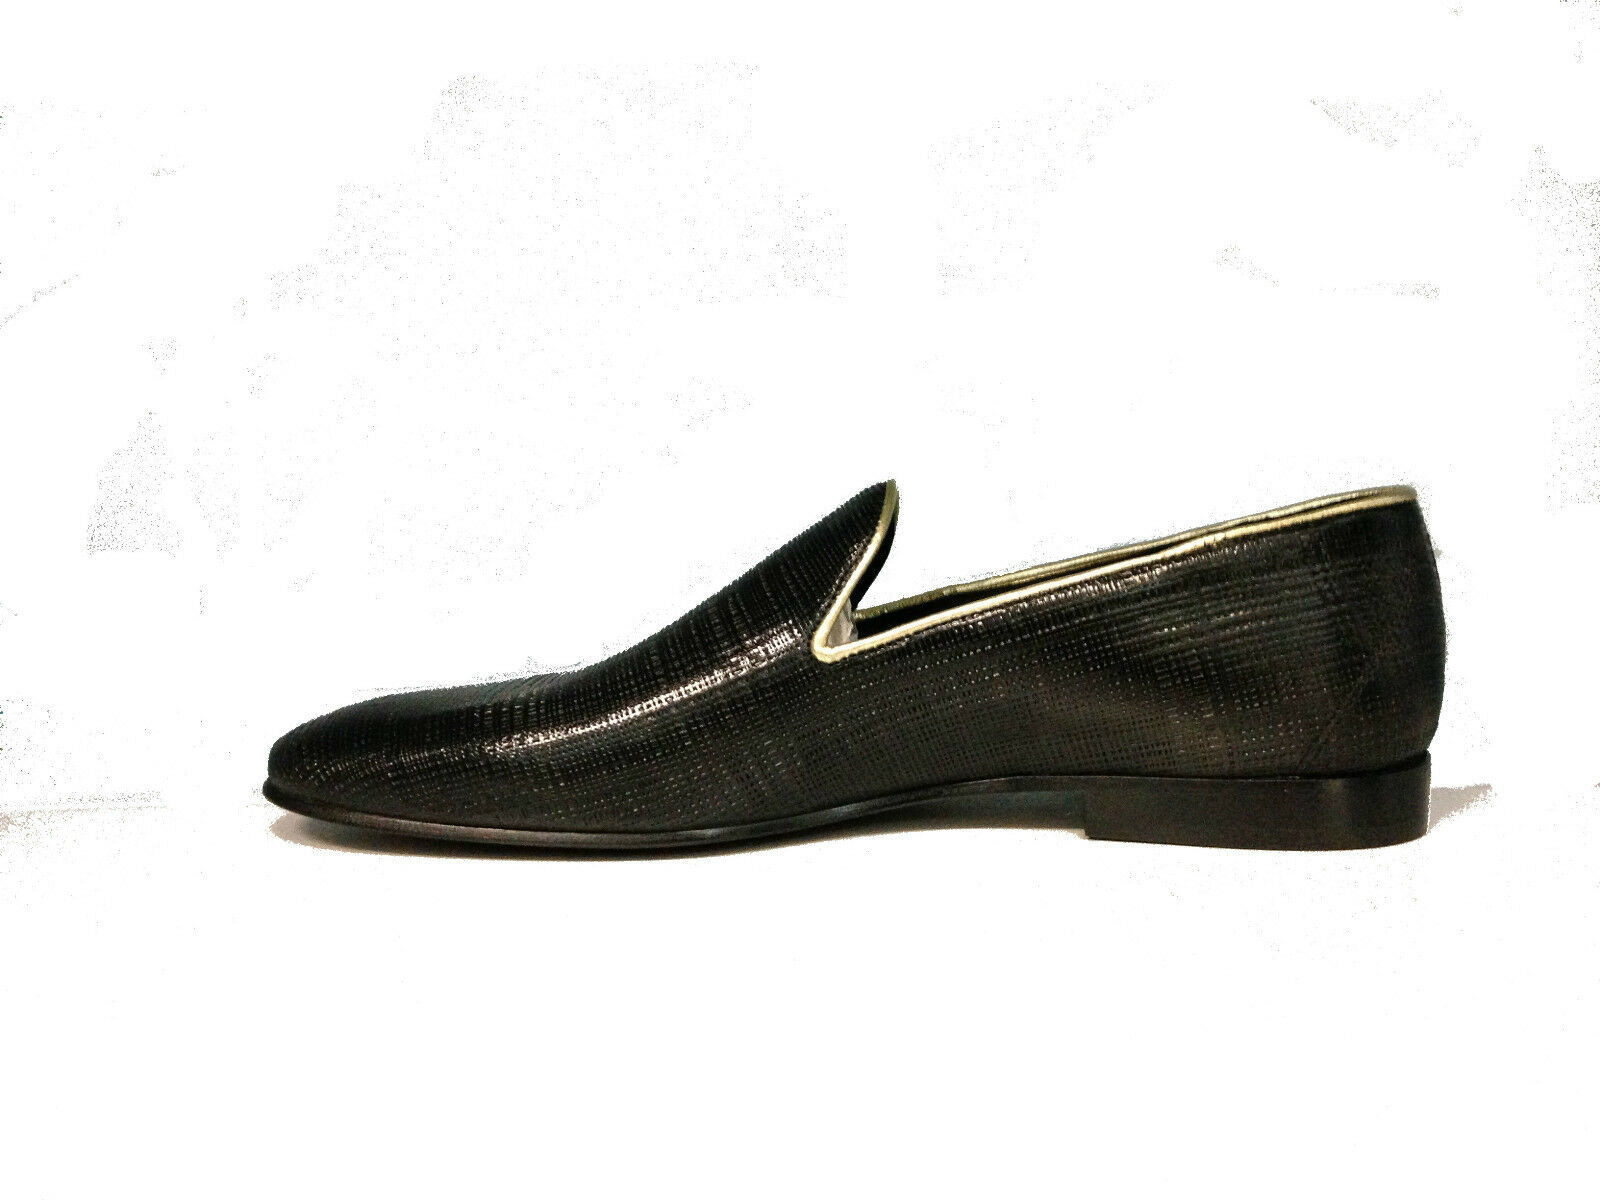 Prem1um scarpa mocassino loafer uomo man in pelle leather 100% mod. LAPO